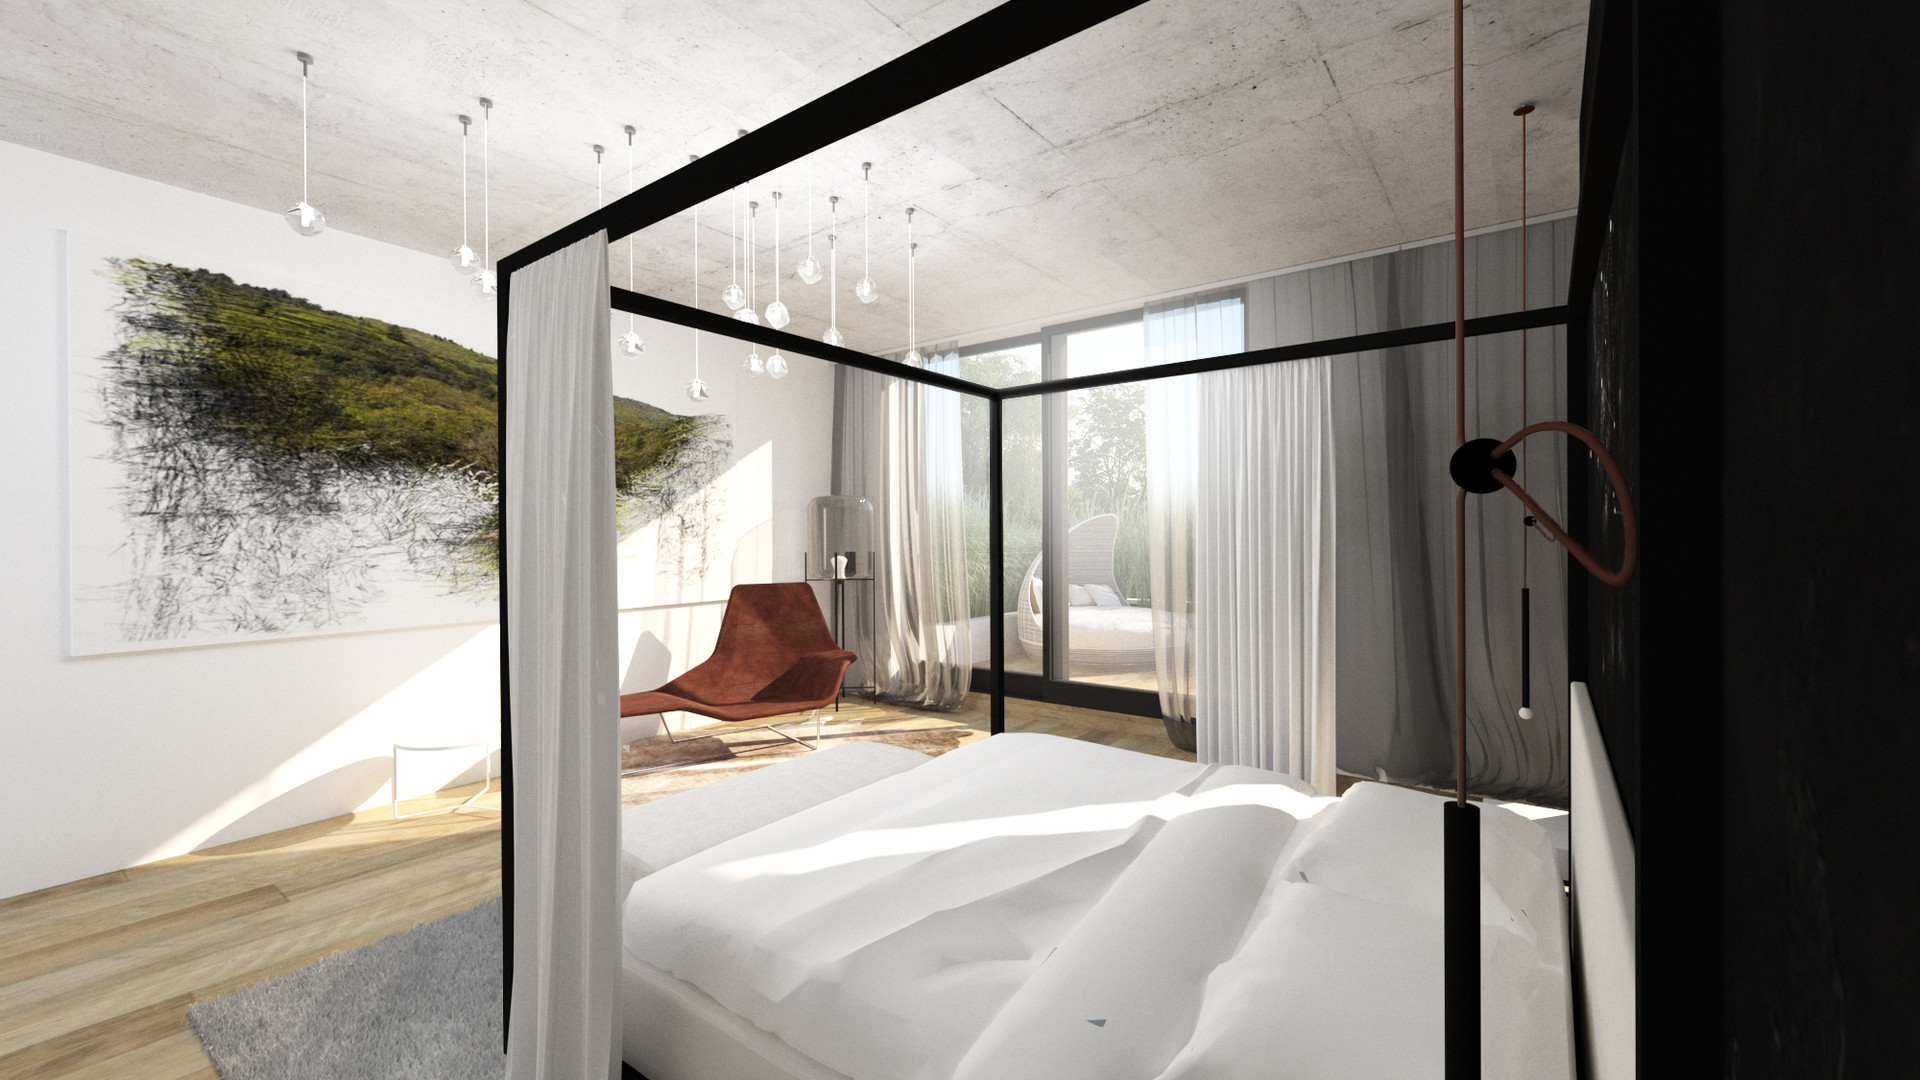 190712_bedroom 2.jpg